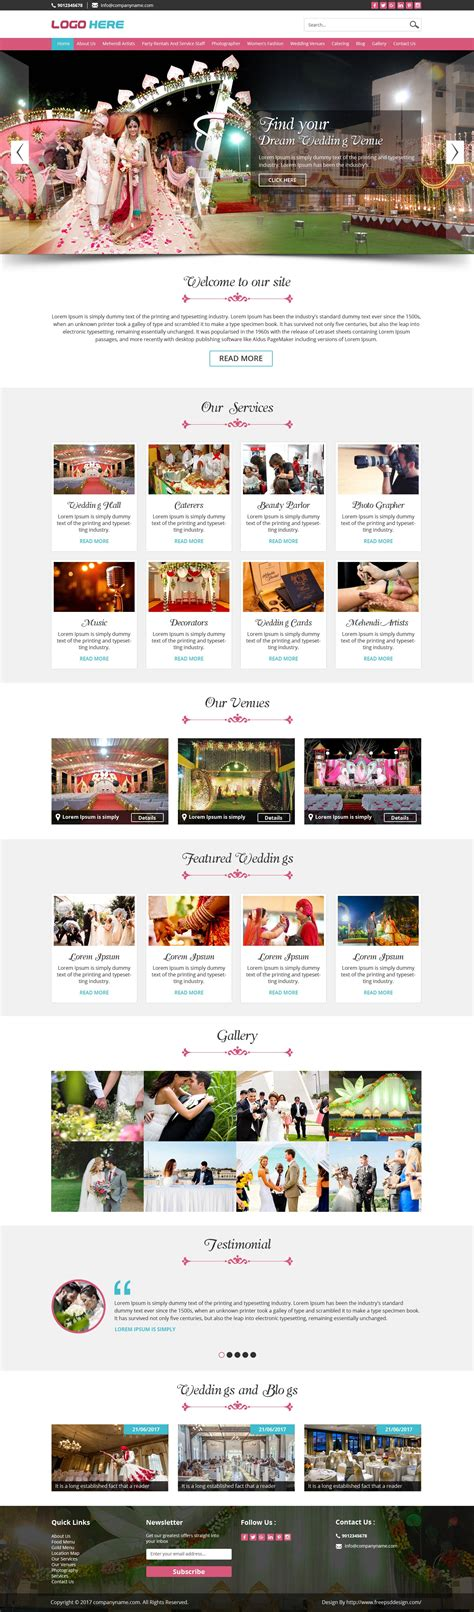 layout event organizer wedding planner and event organizer design psd template